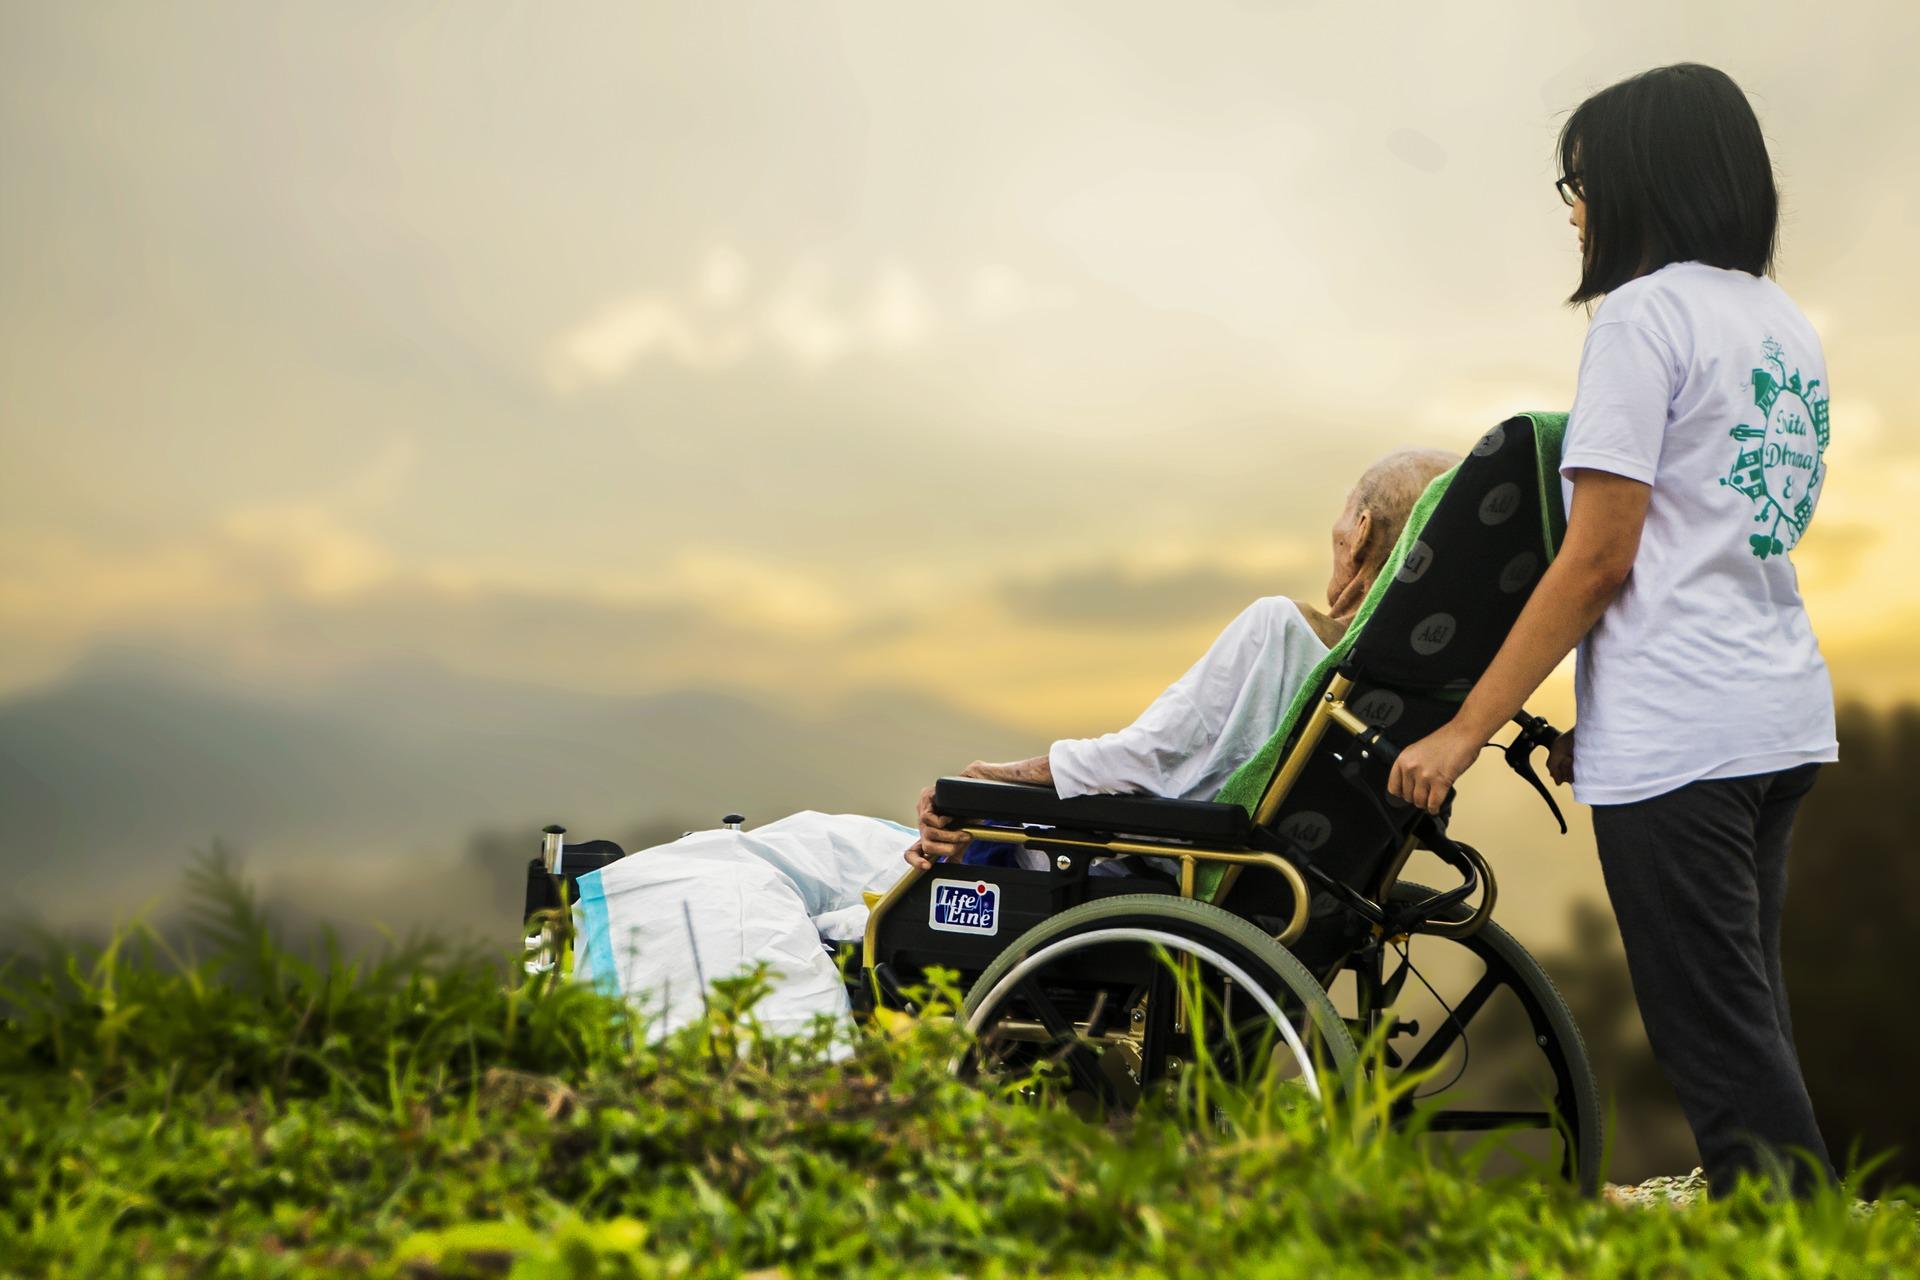 hospice-1821429_1920 (330 kB)